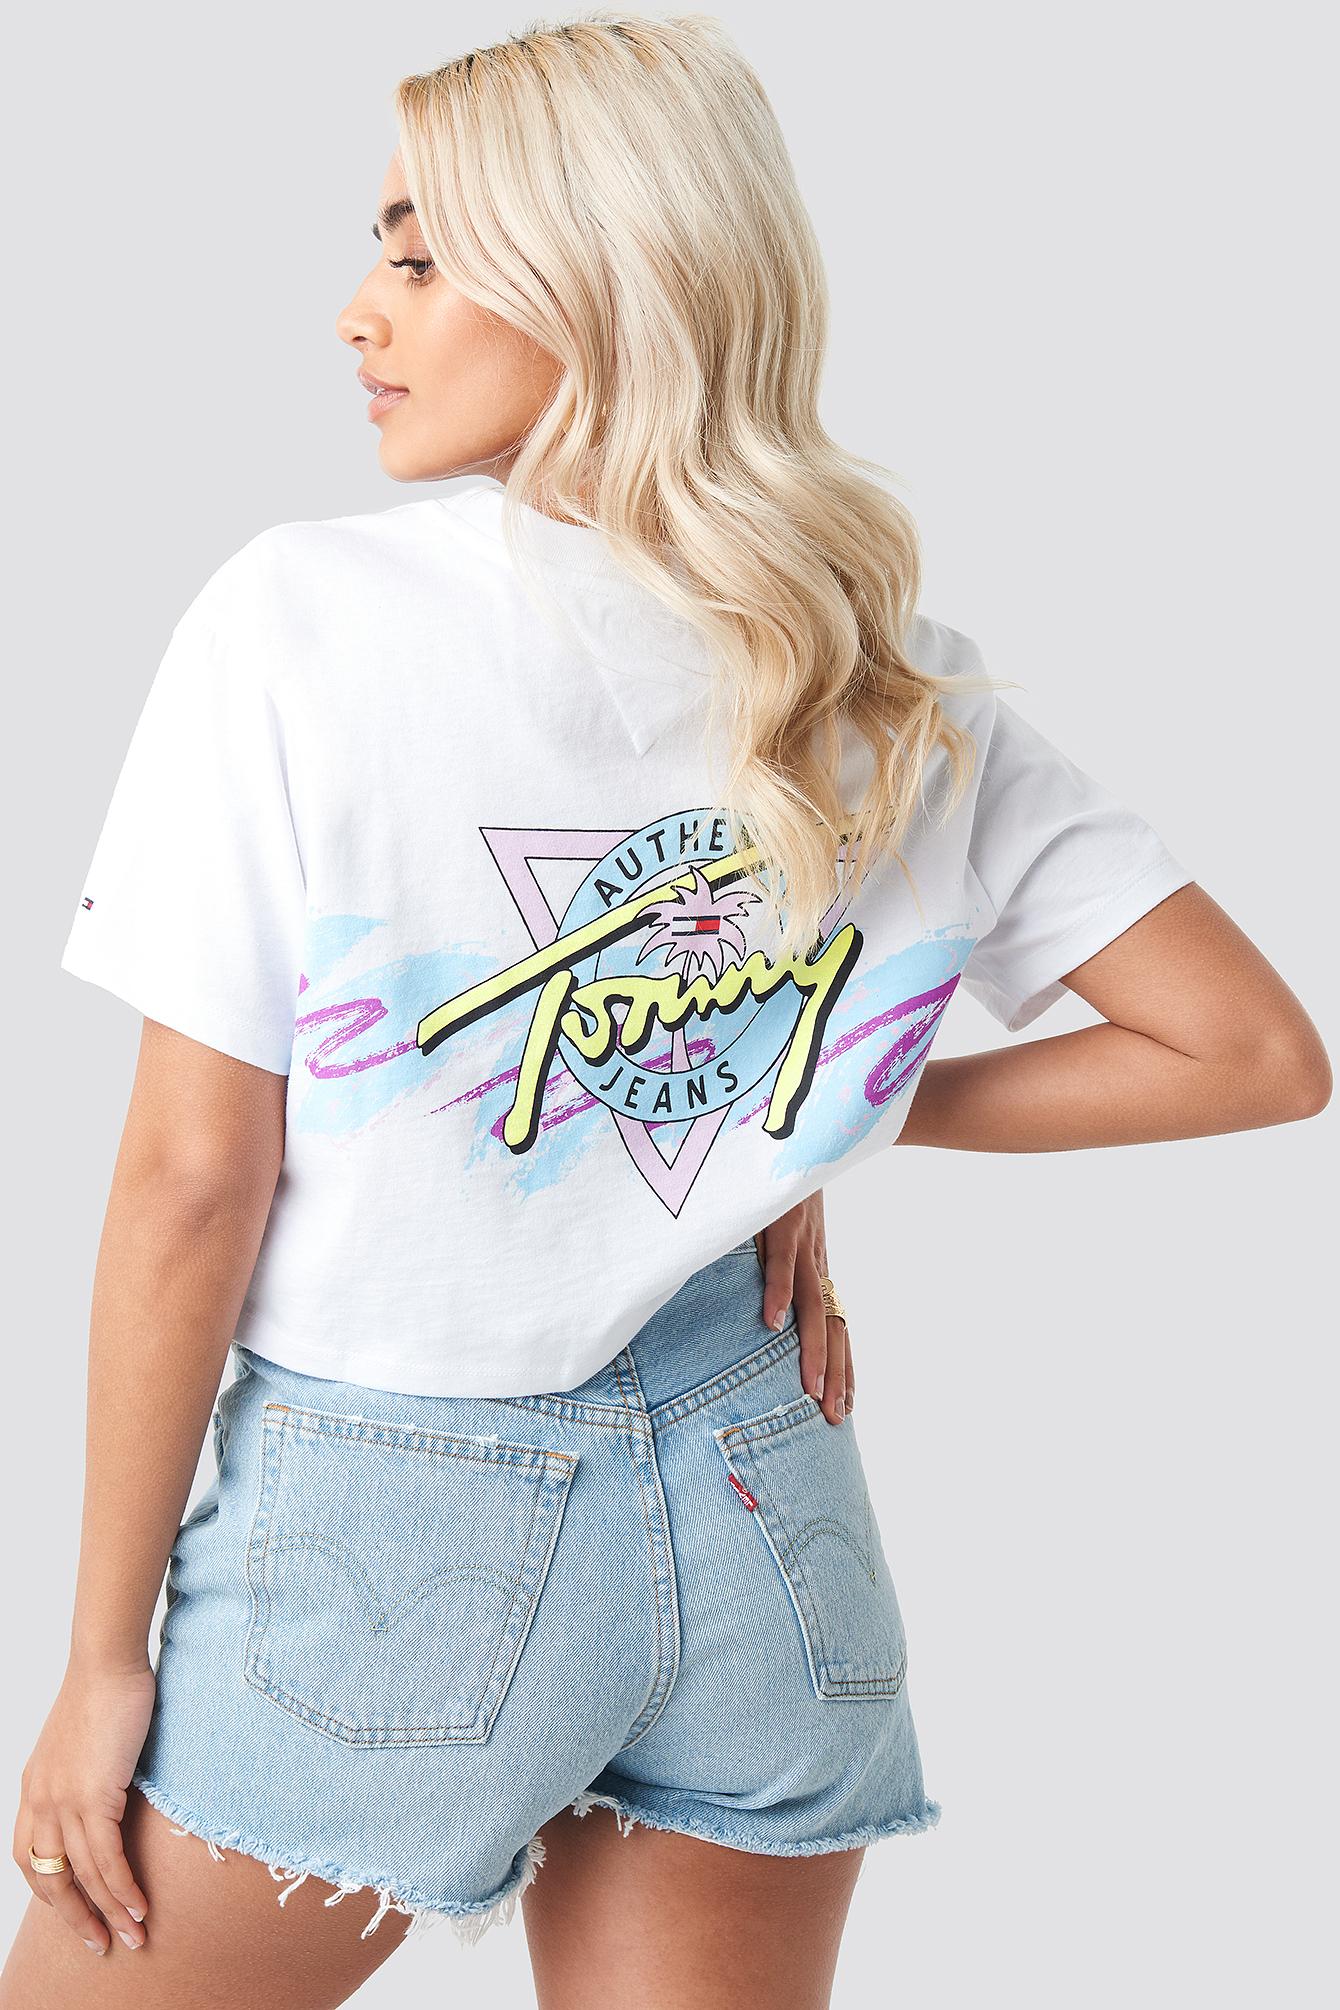 Tommy Jeans Retro Tee NA-KD.COM